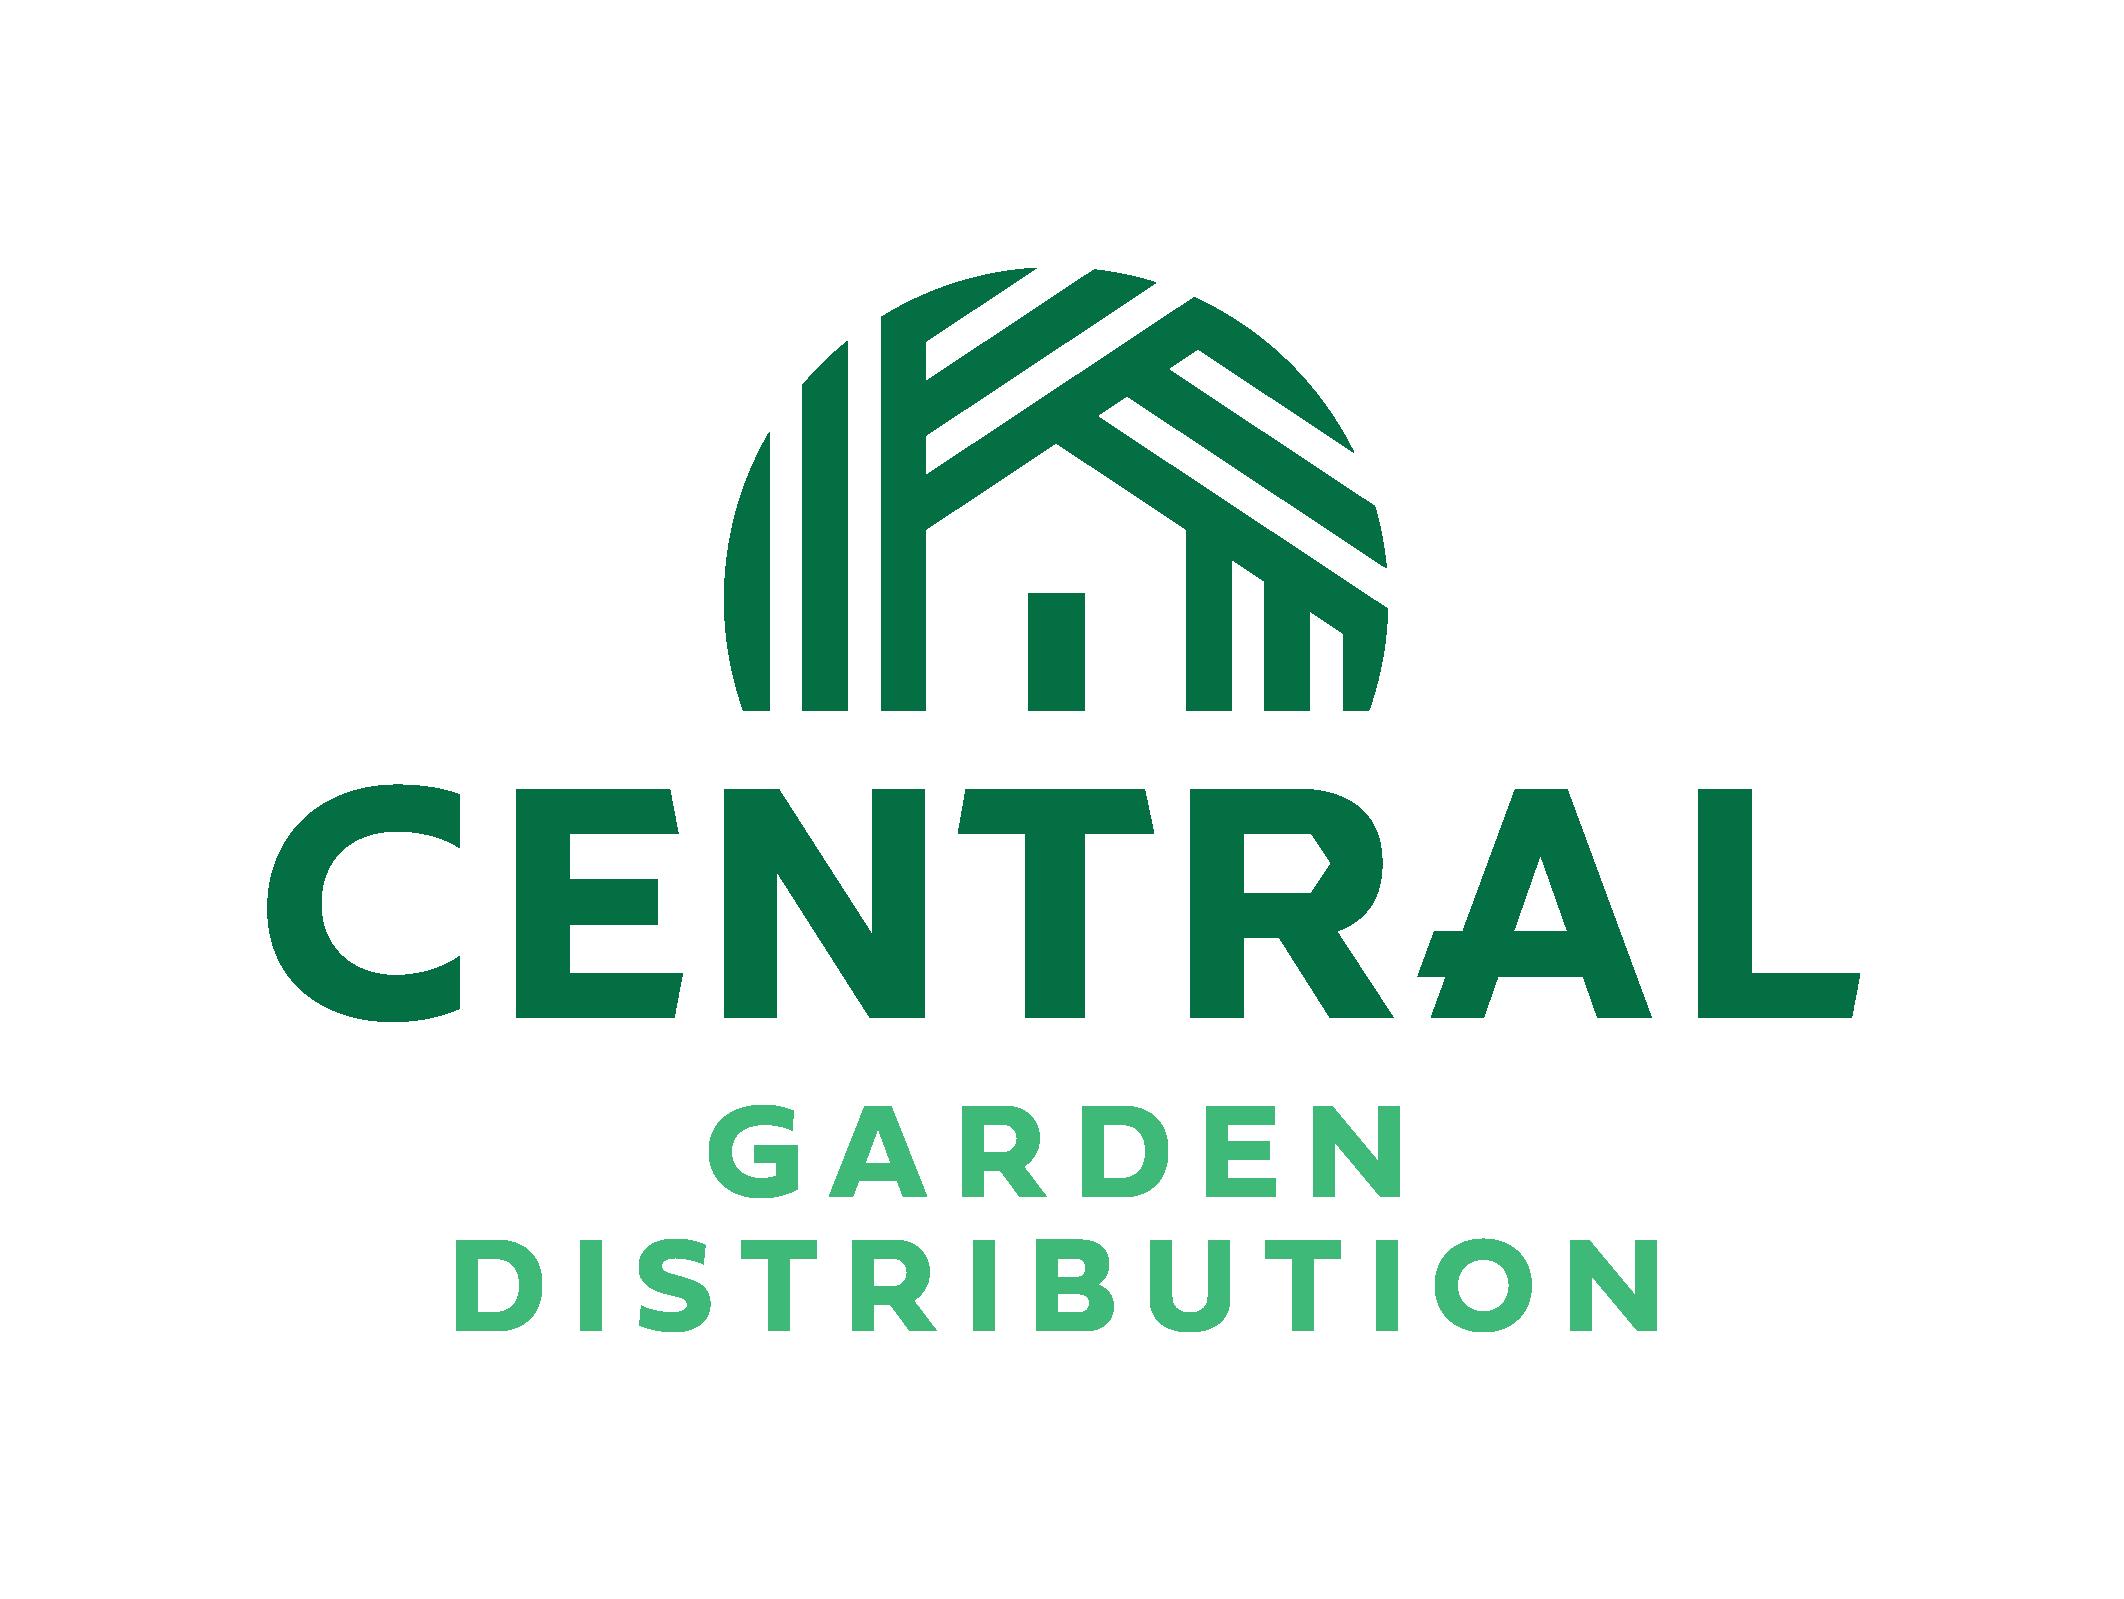 Central Garden Distribution